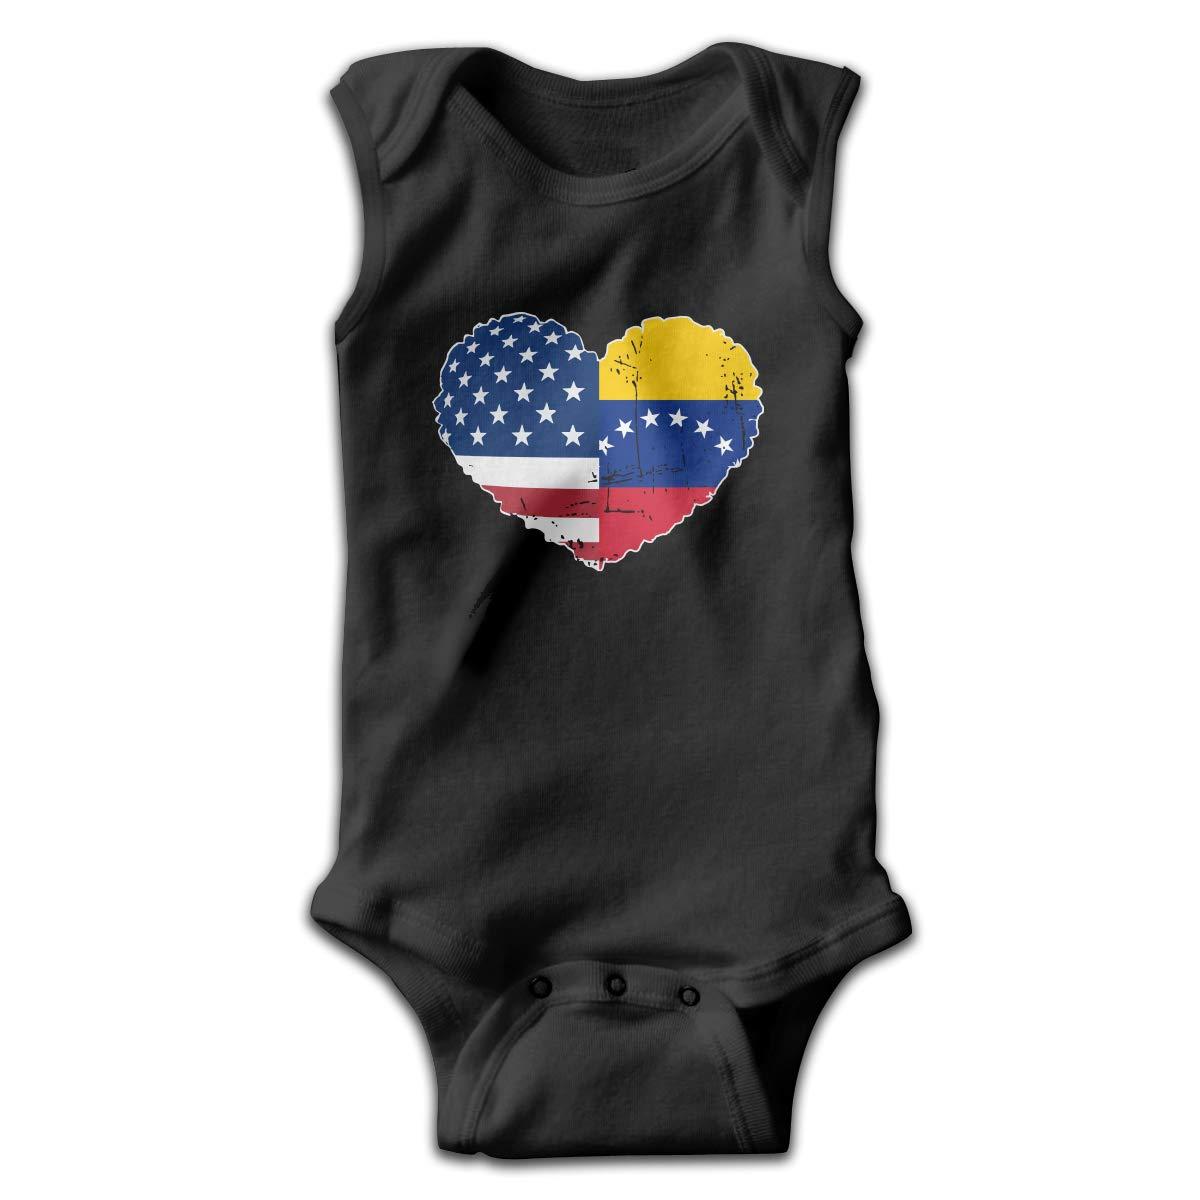 MMSSsJQ6 Venezuela USA Flag Heart Baby Newborn Crawling Clothes Sleeveless Romper Bodysuit Rompers Jumpsuit